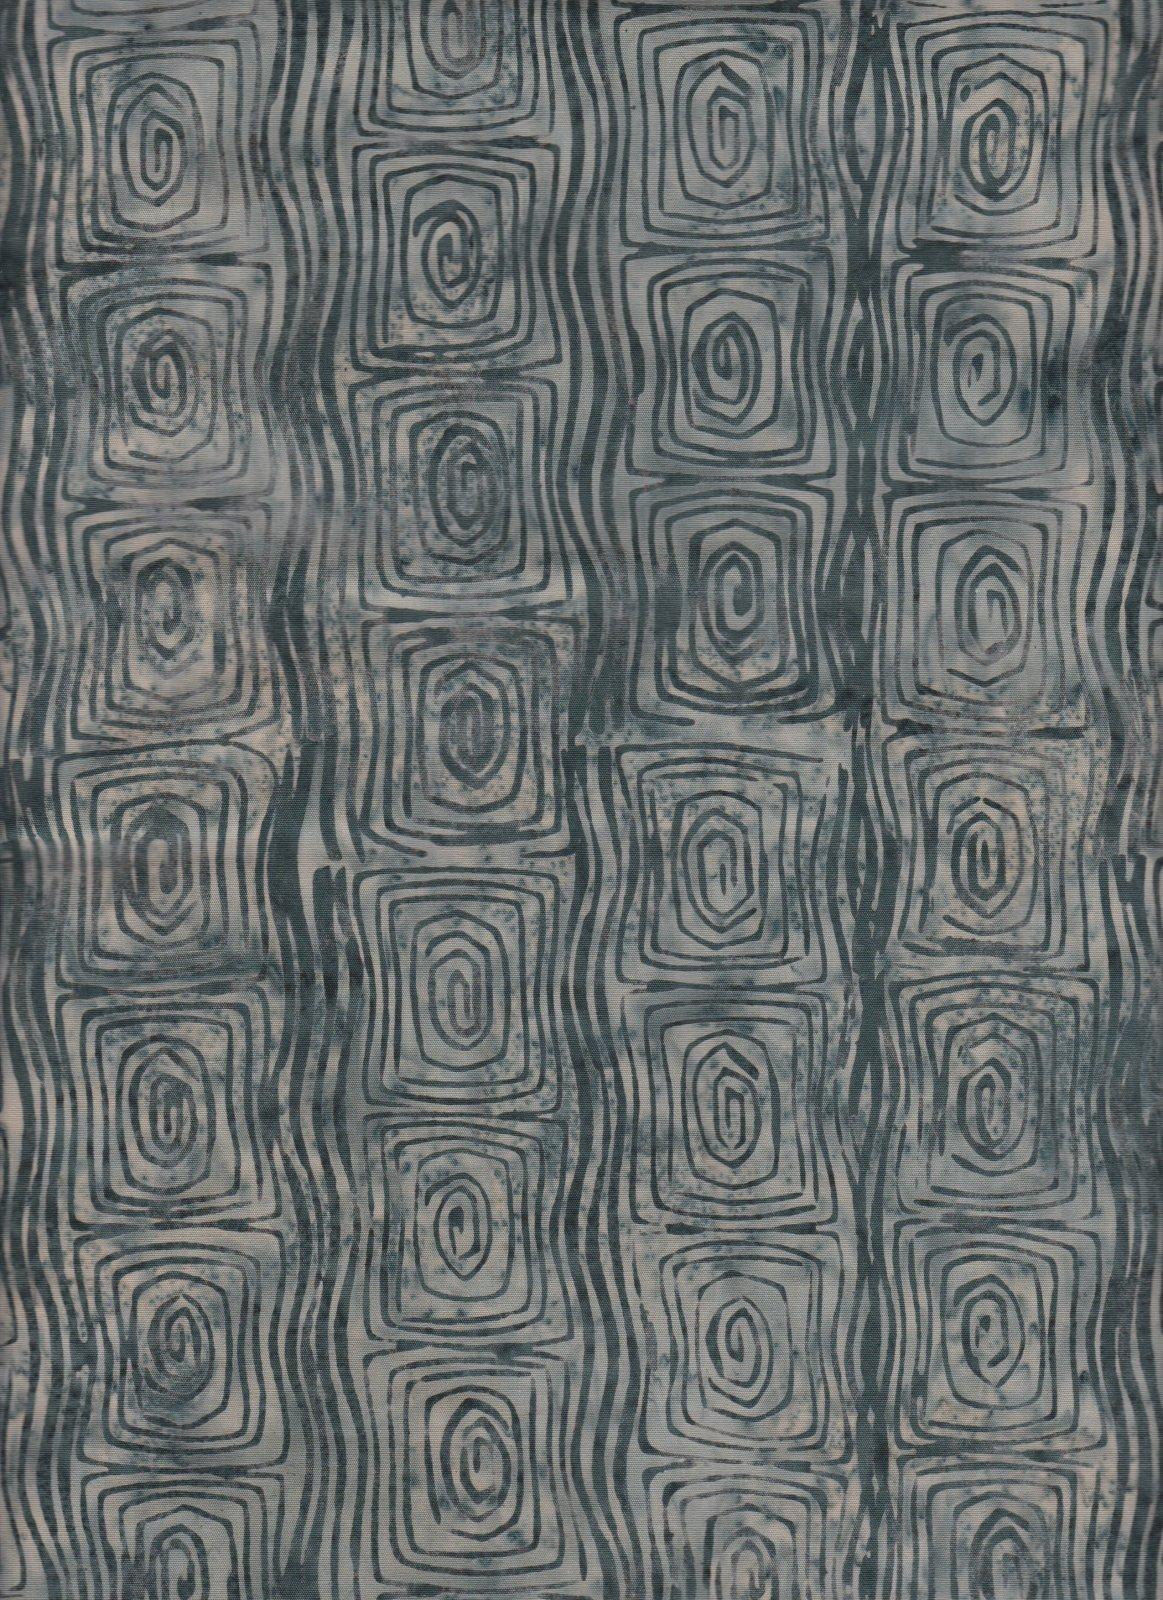 Island Batik - 111802705 - Tortoise Shell/Glacier